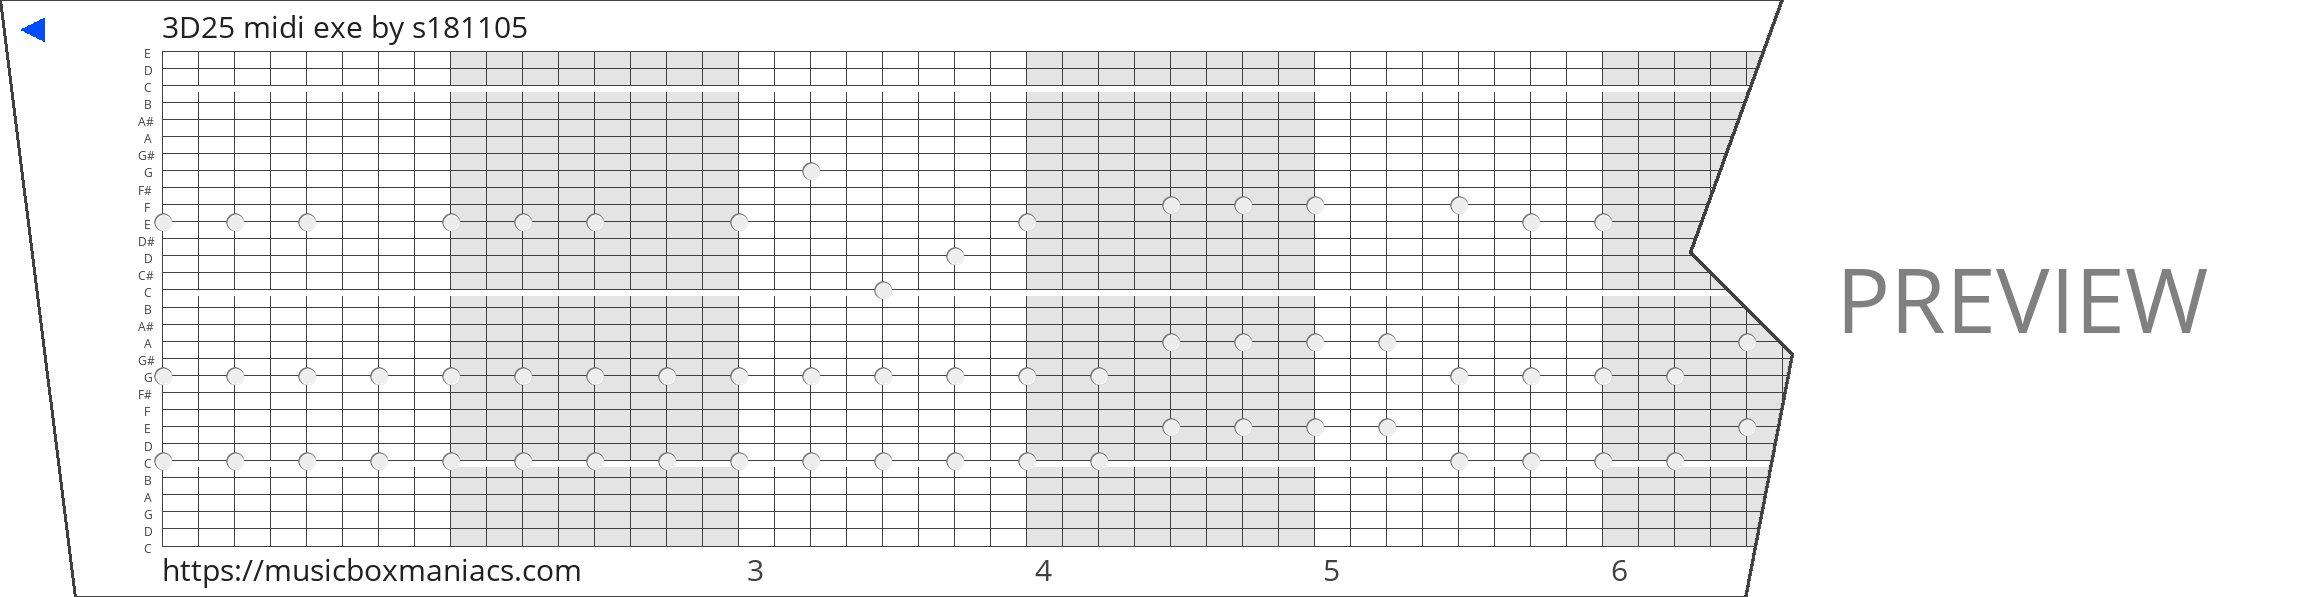 3D25 midi exe 30 note music box paper strip